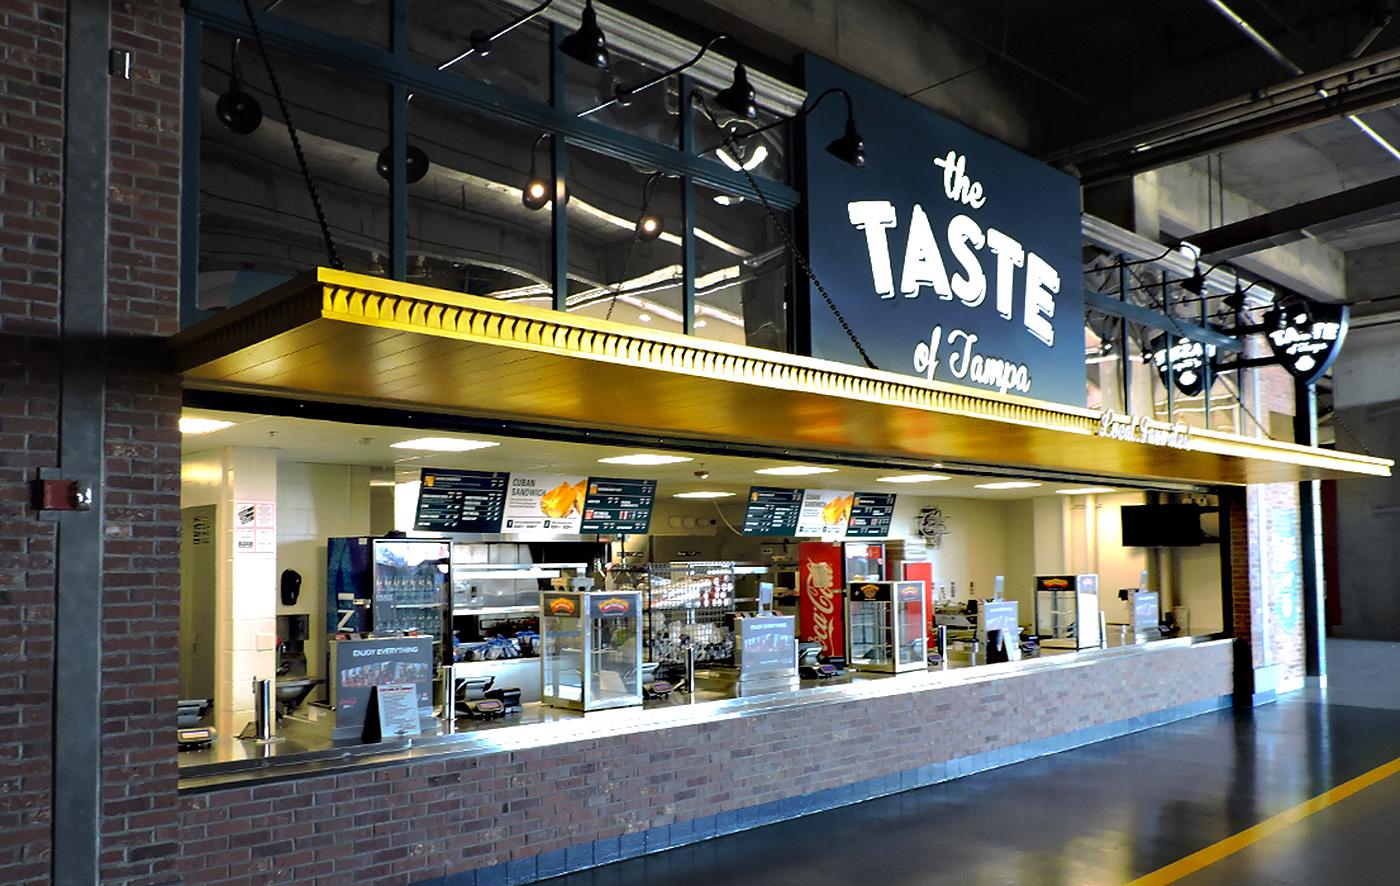 fl-retail-taste of tampa 1.jpg